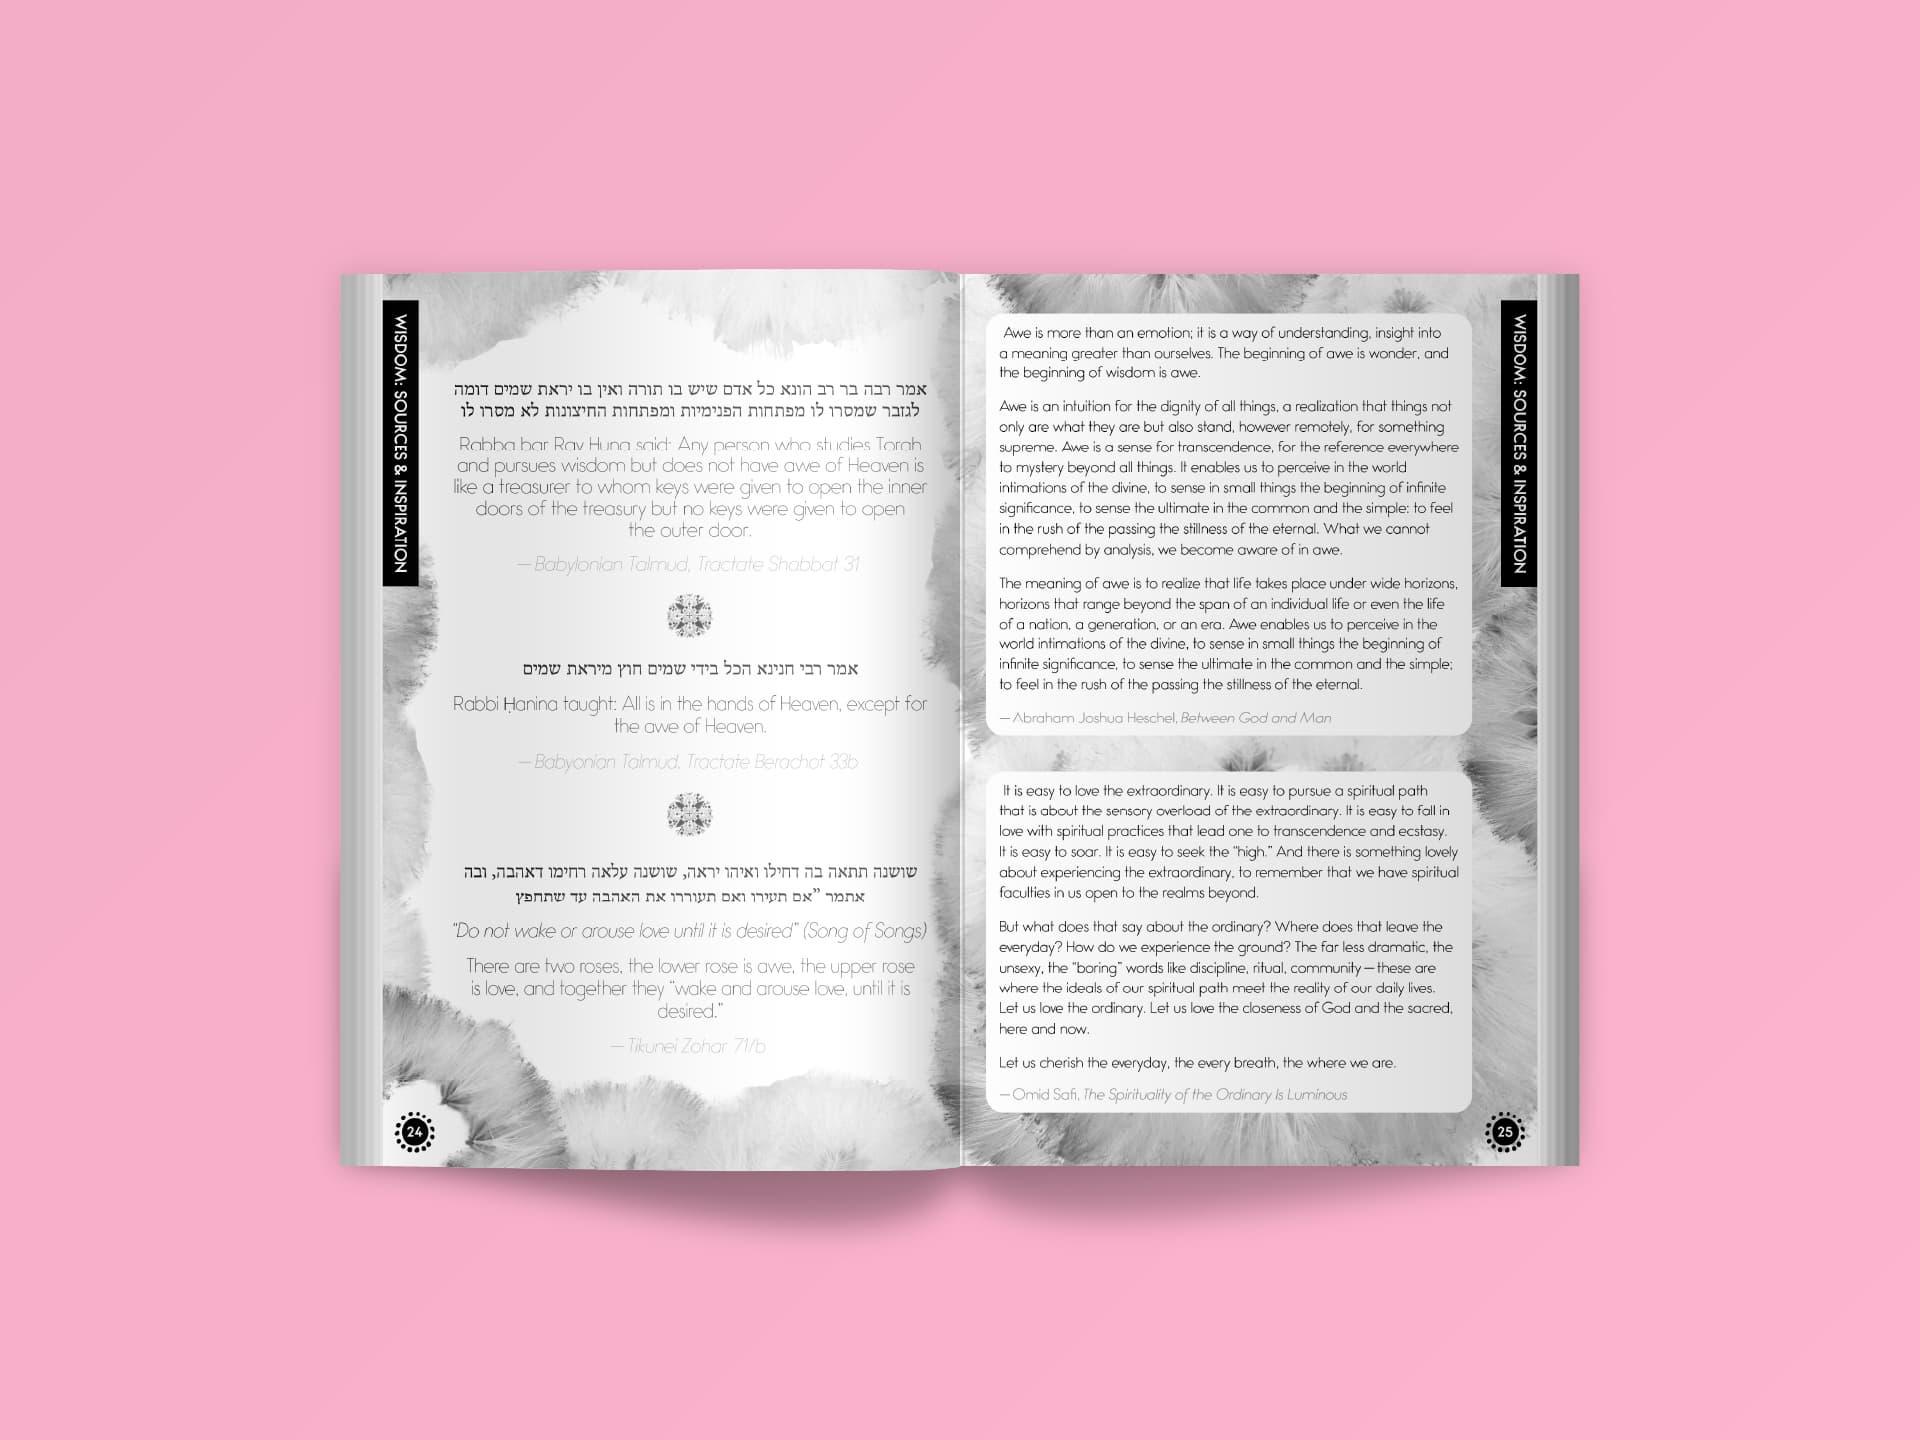 Program (Pages 24-25)